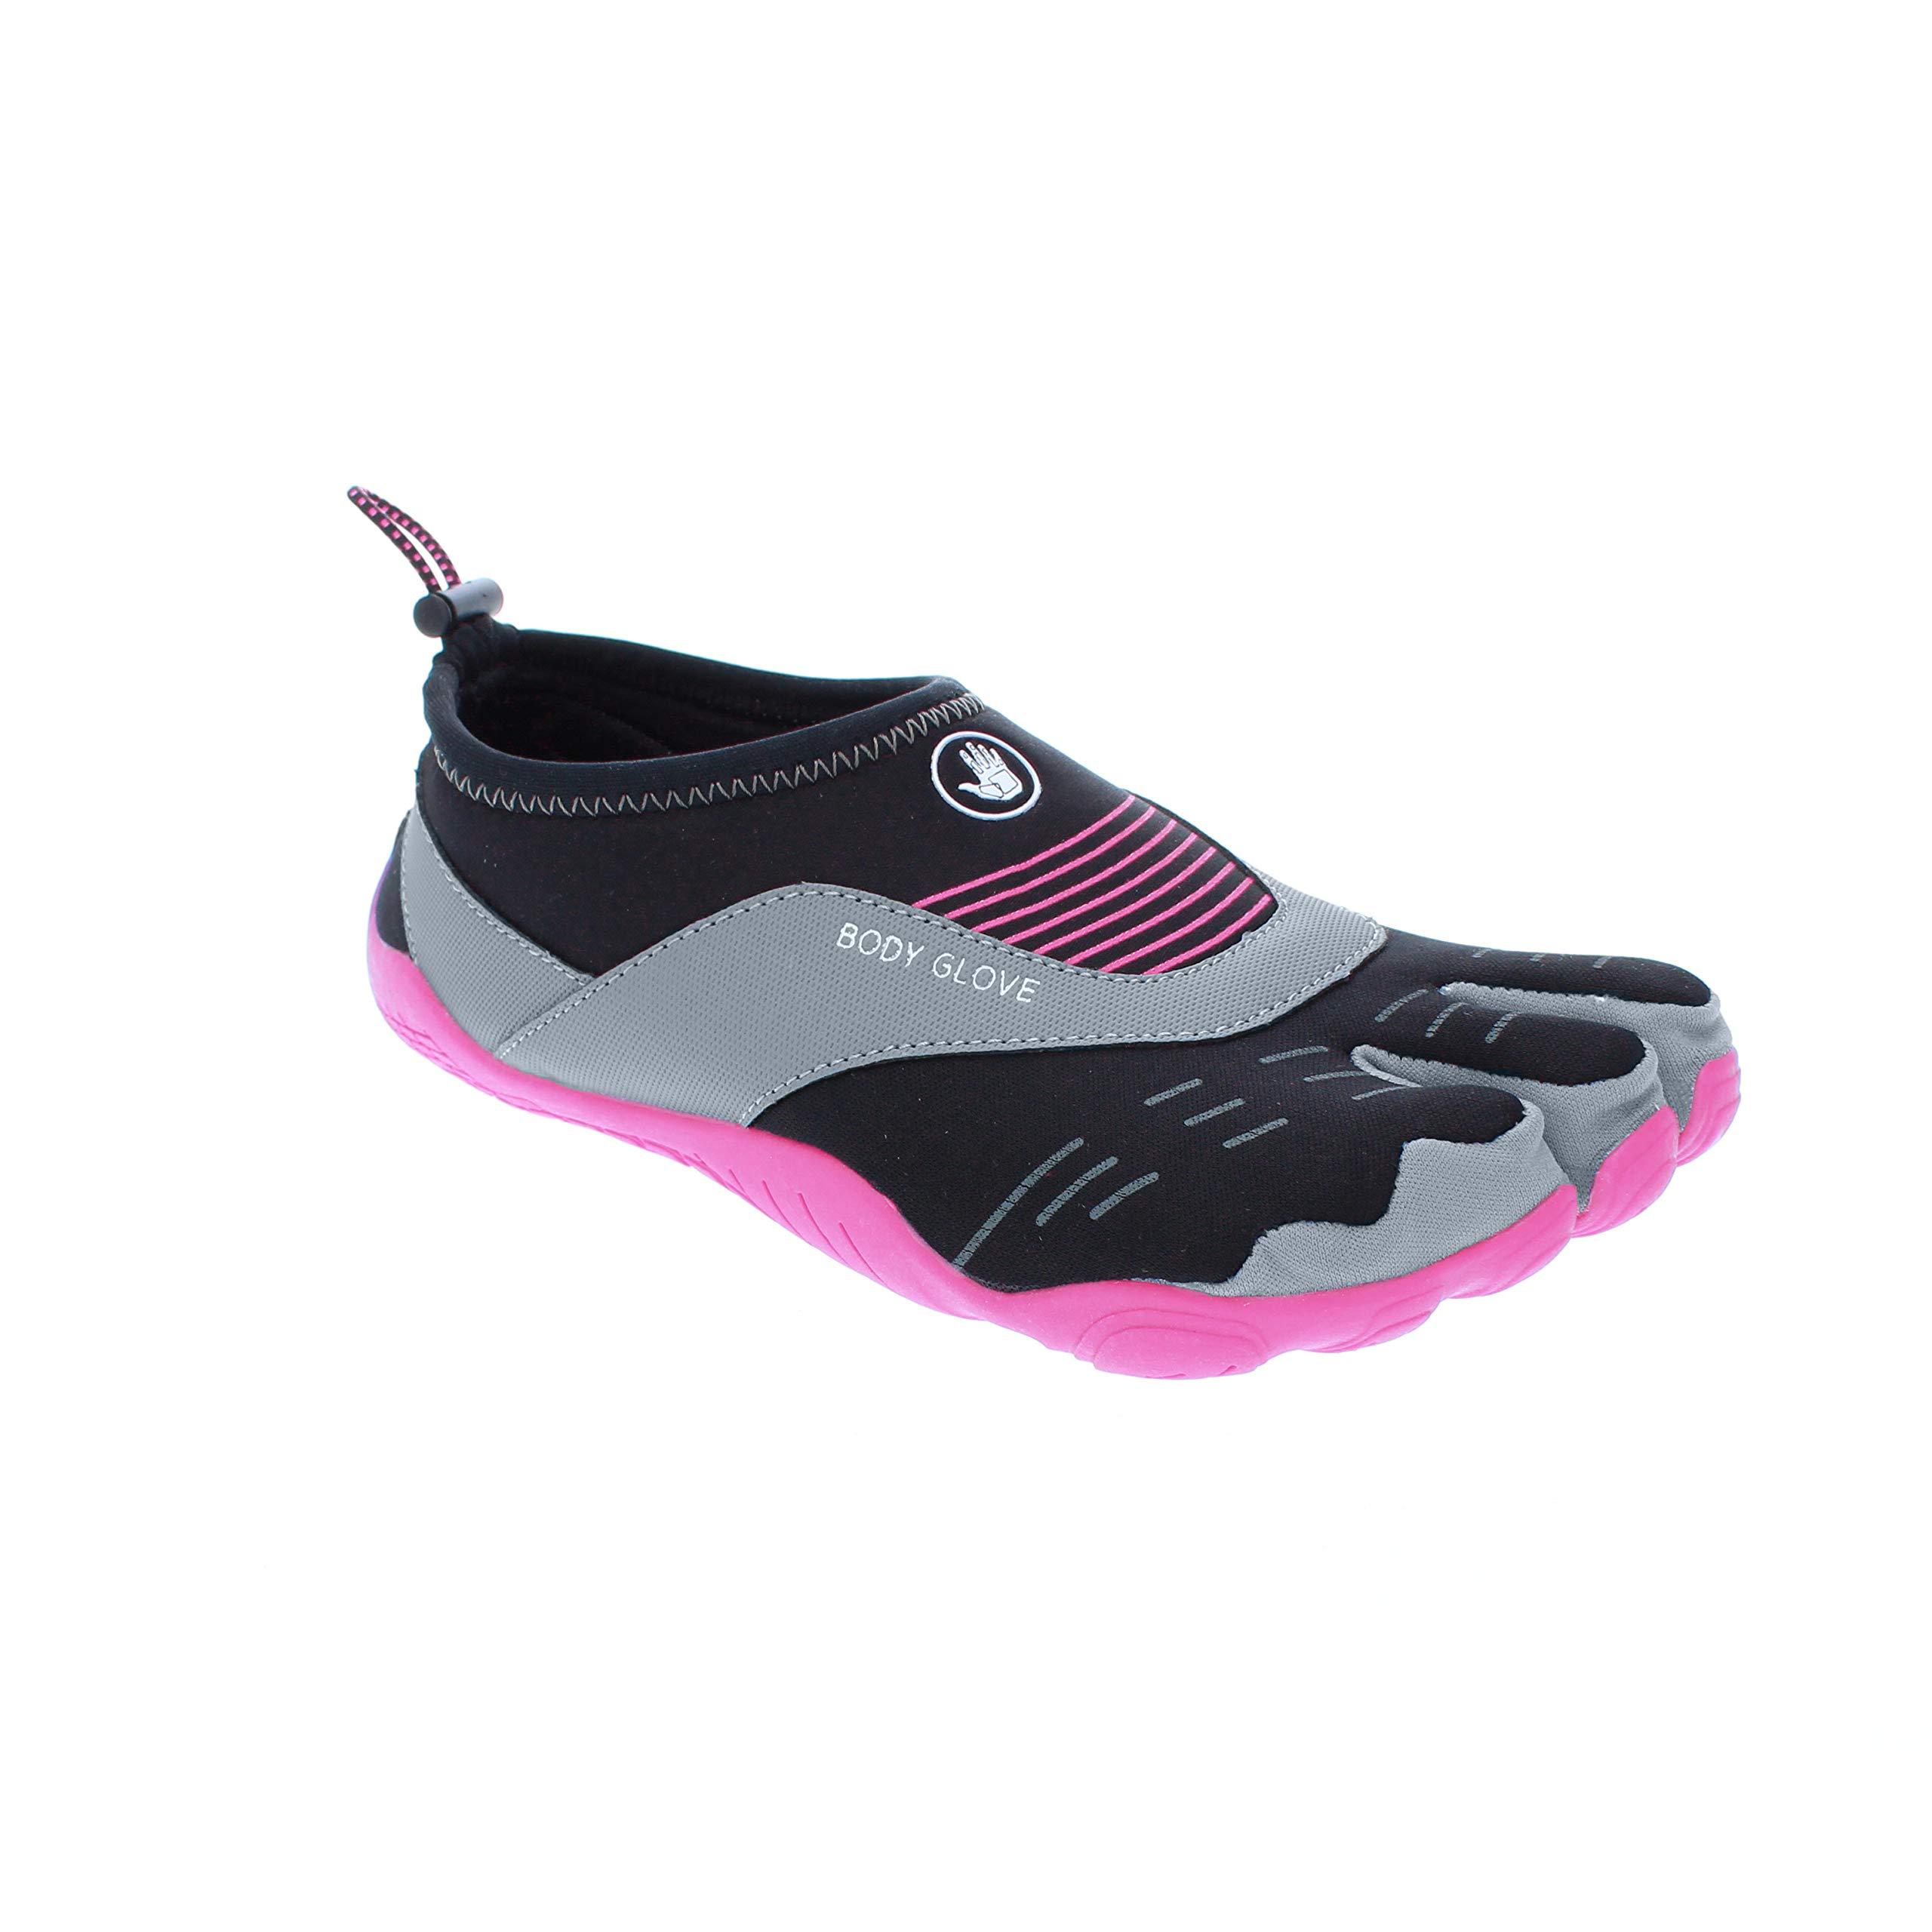 Body Glove Women's 3T Barefoot Cinch Water Shoe, Black/Flamingo Pink, 10 by Body Glove